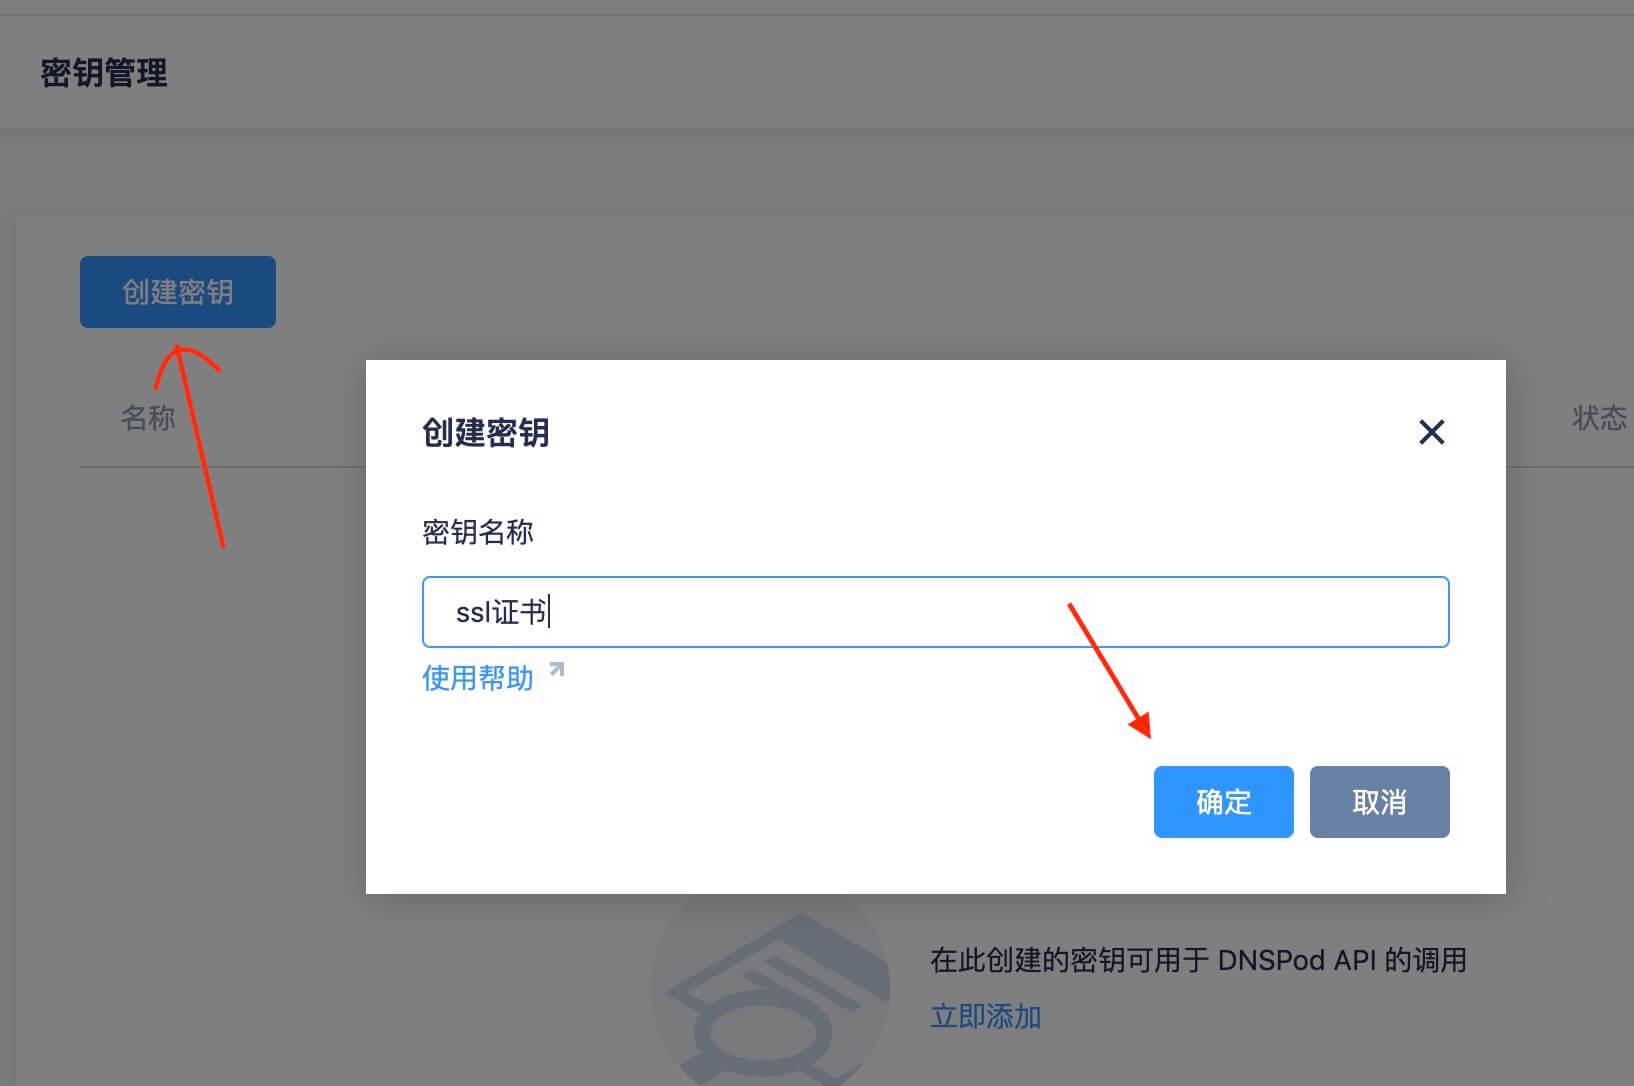 《Let's Encrypt 泛域名证书申请 腾讯云DNS服务器解析域名 DNSPod管理》